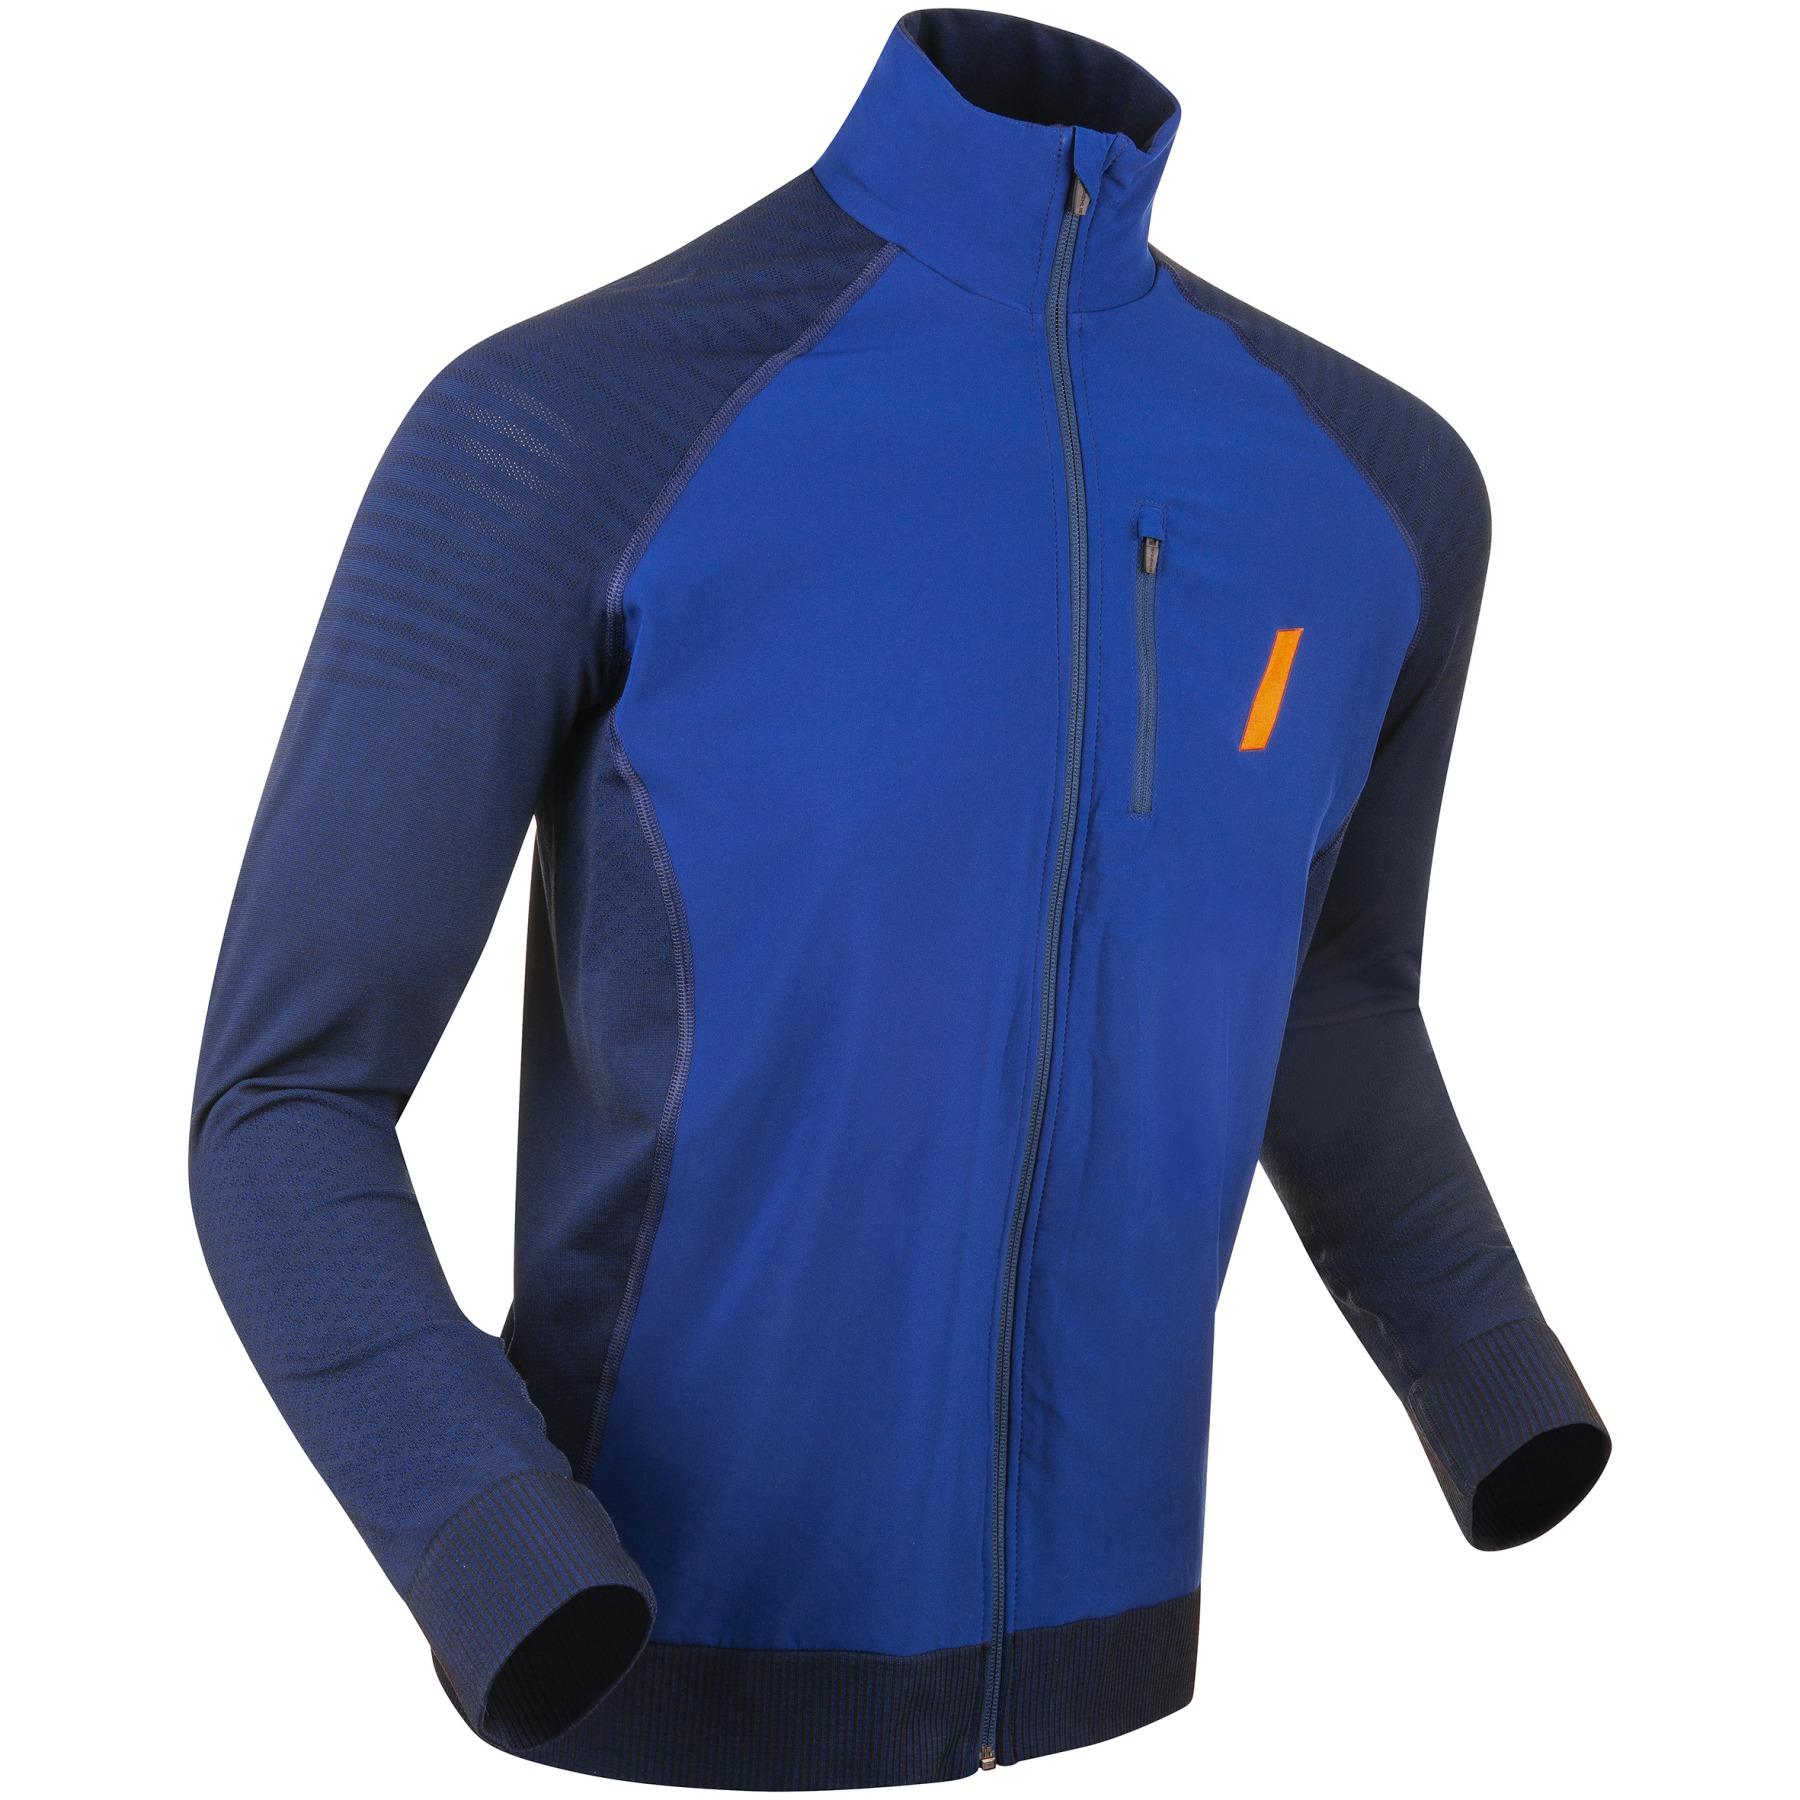 Daehlie Jacket Seamless Push for Men - Estate Blue 25300